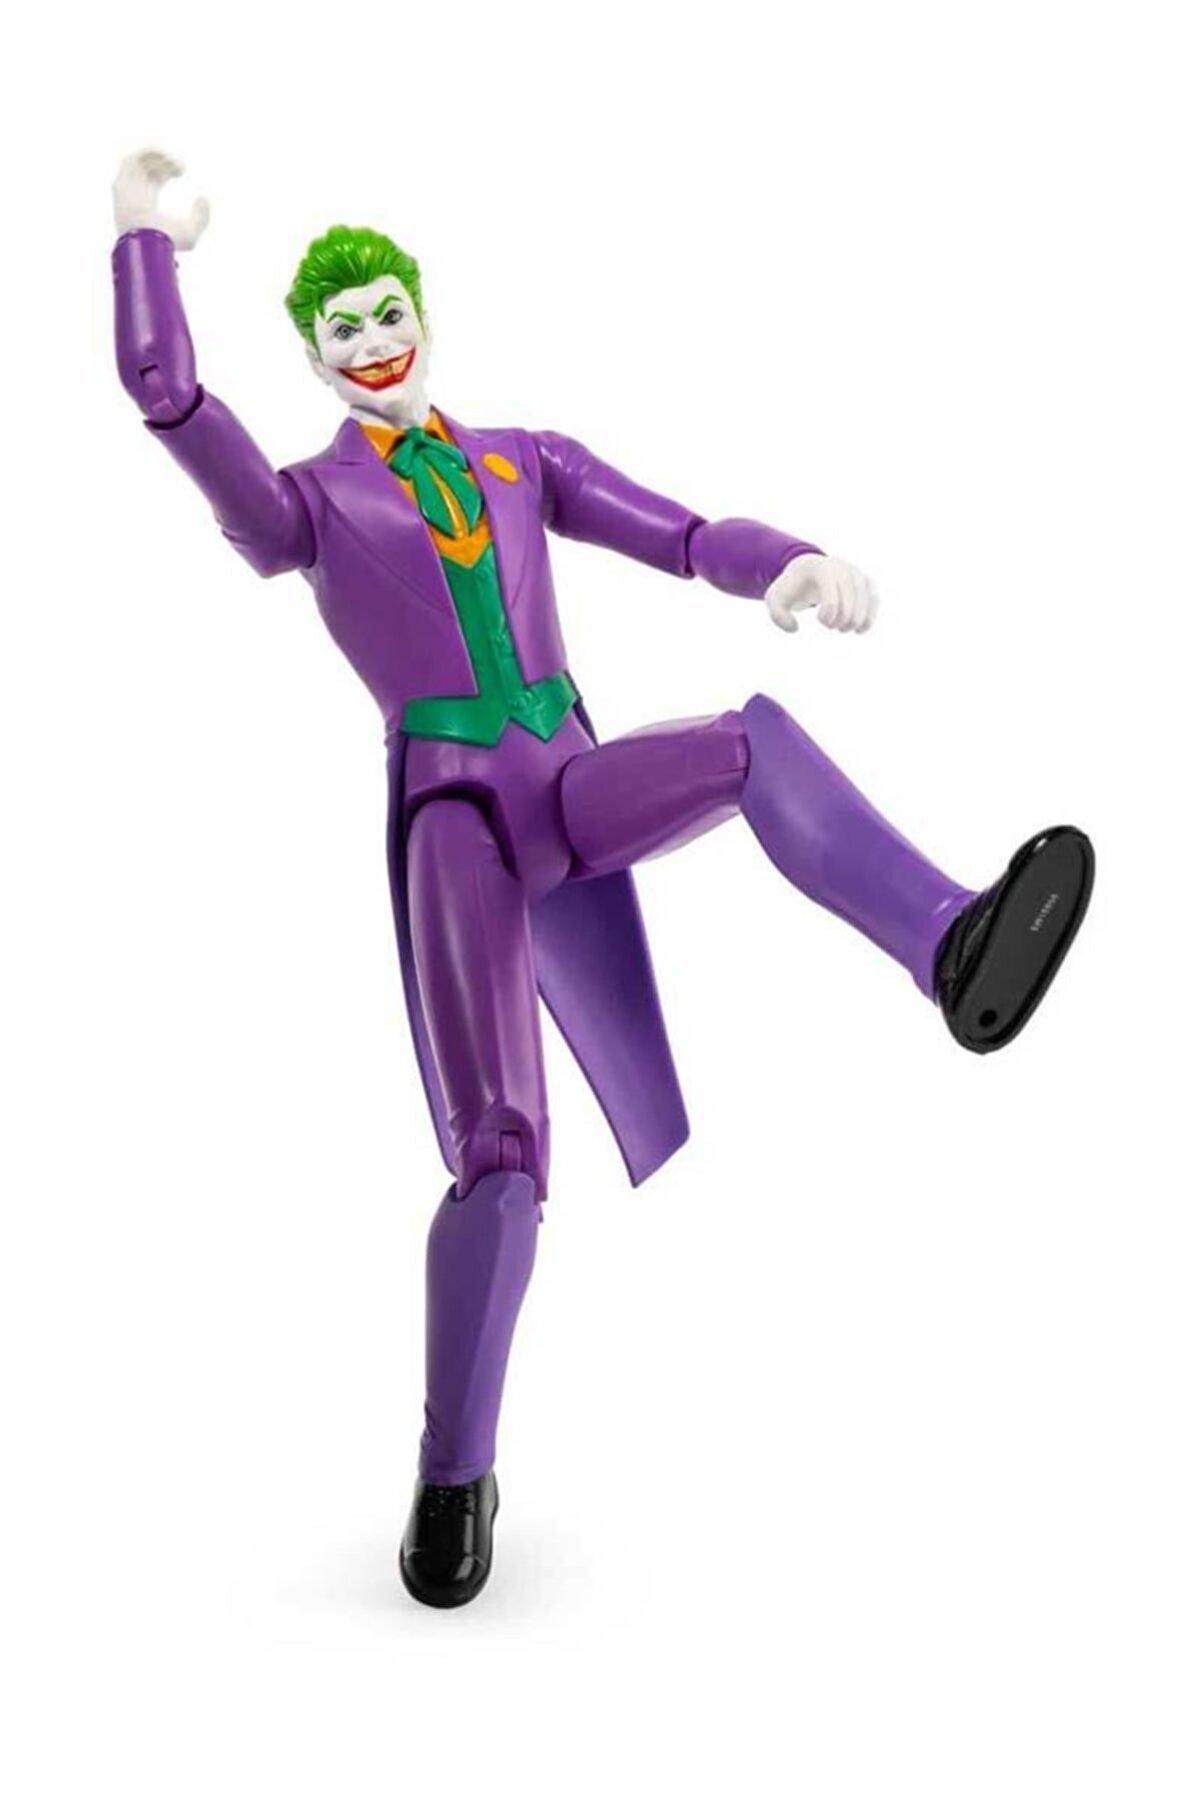 Spinmaster Batman Aksiyon Figür 30 cm. - Joker